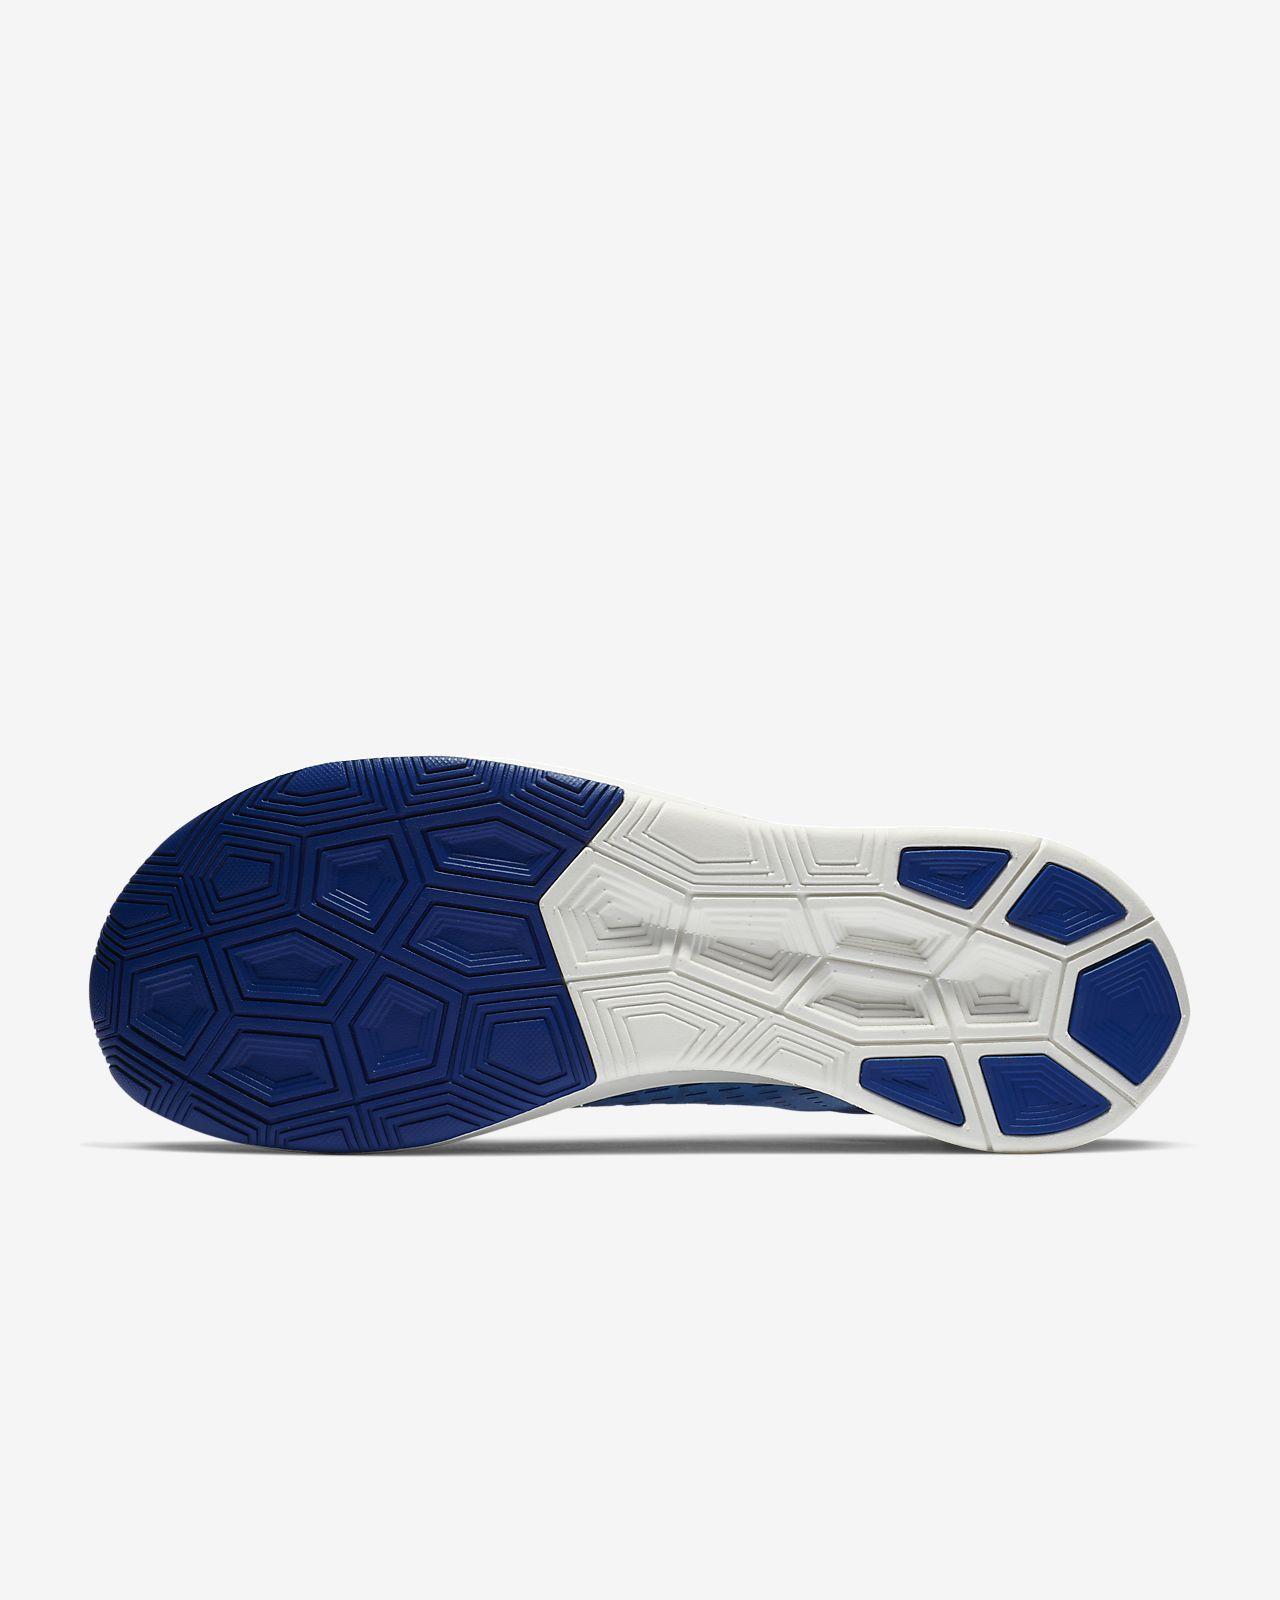 6cbd92bedf00 Nike Zoom Fly SP Fast Women s Running Shoe. Nike.com FI